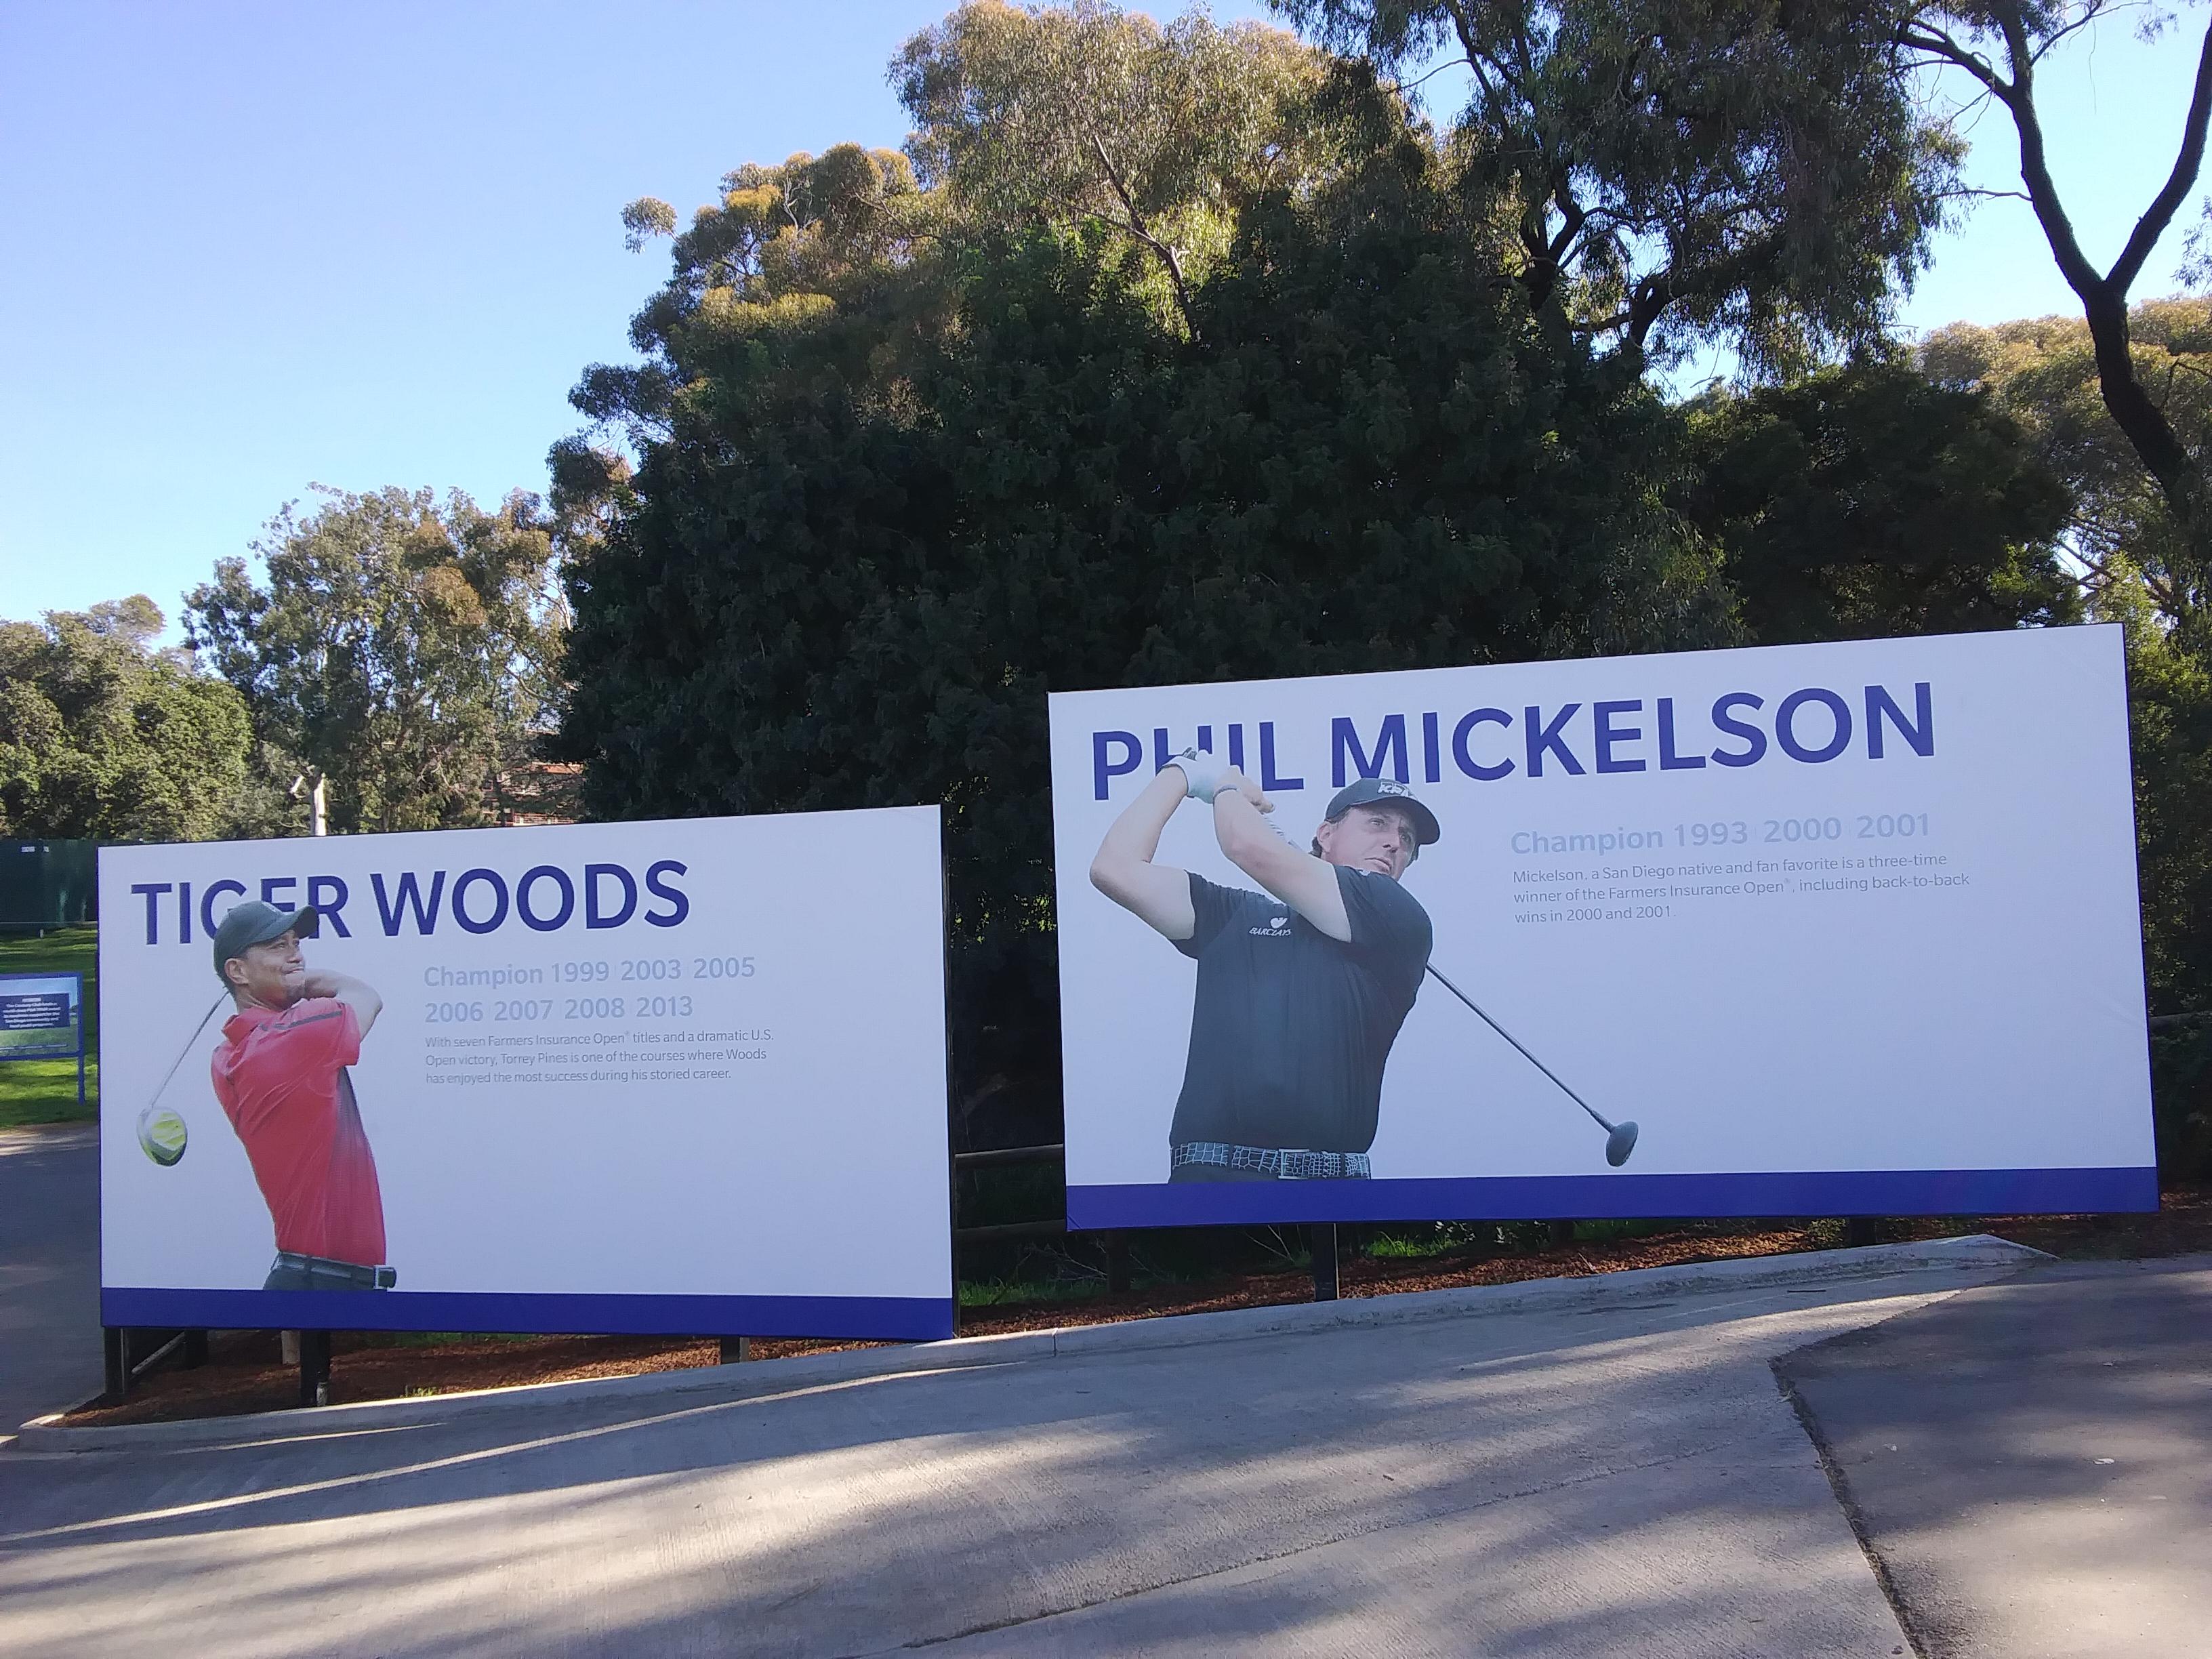 Promotional Info signs. PGA Golf Tournament. Torrey Pines, California. Fitlifeandtravel.com